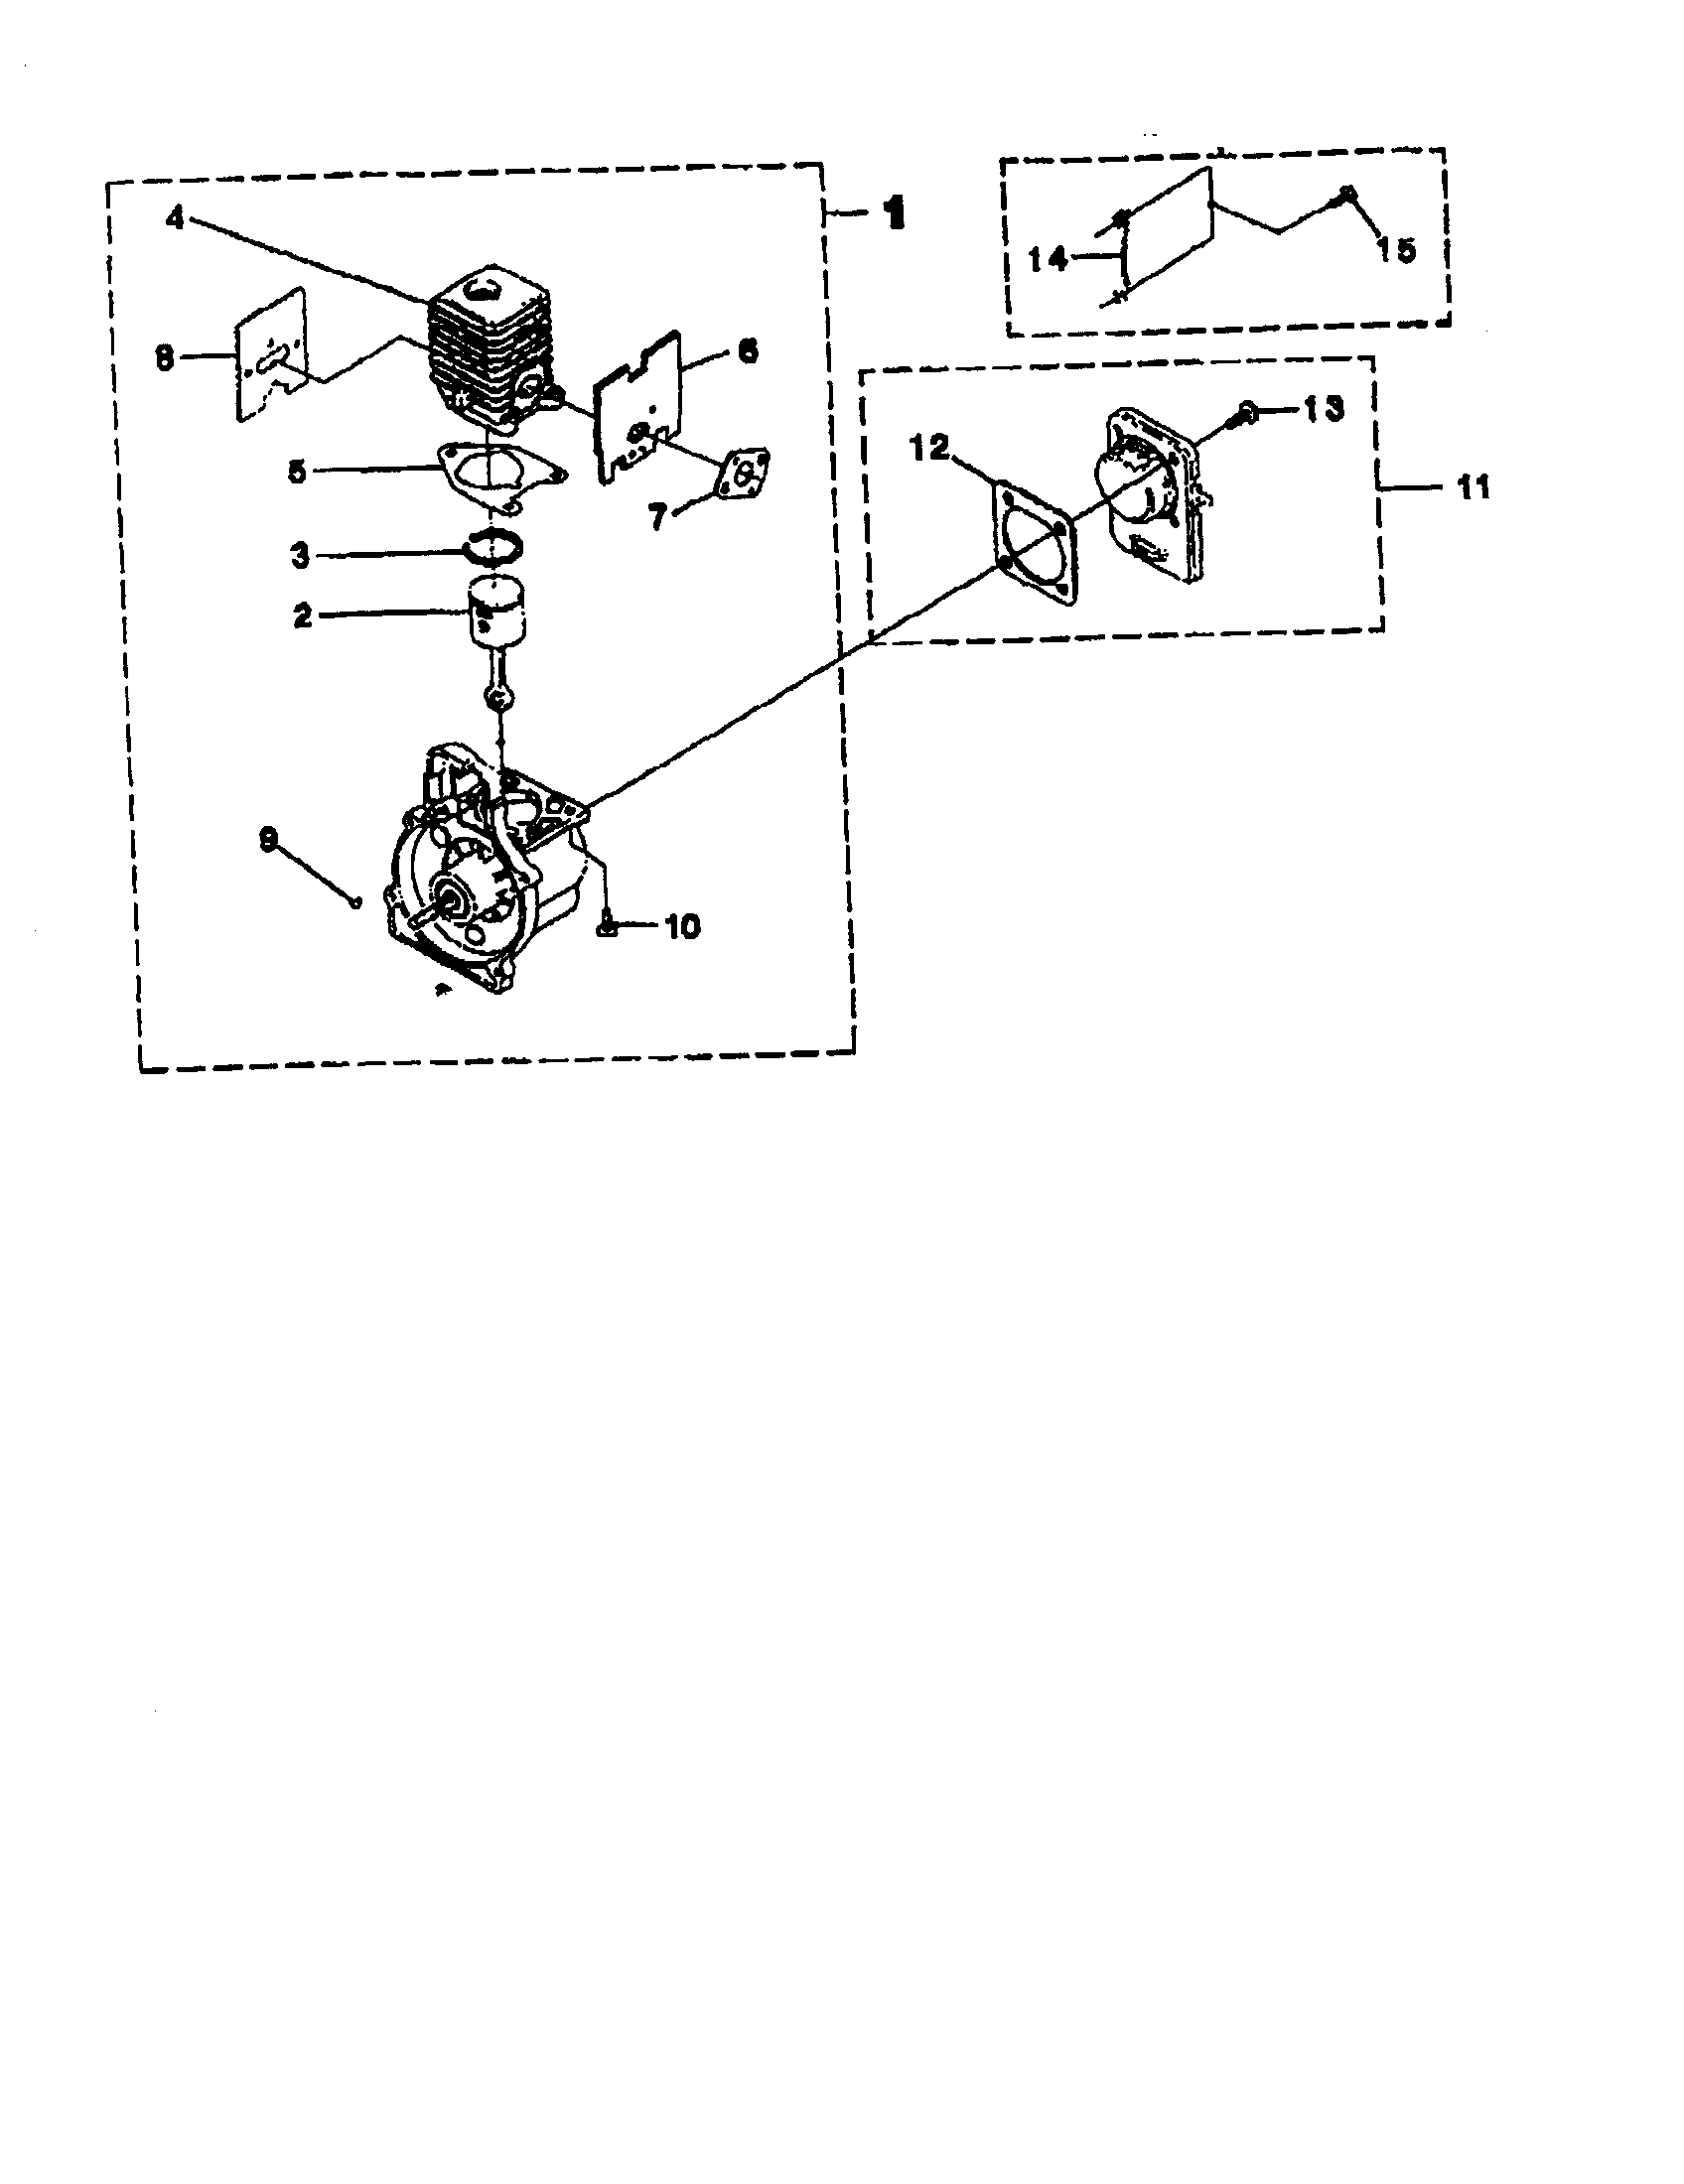 Homelite model UT-20706 line trimmers/weedwackers, gas